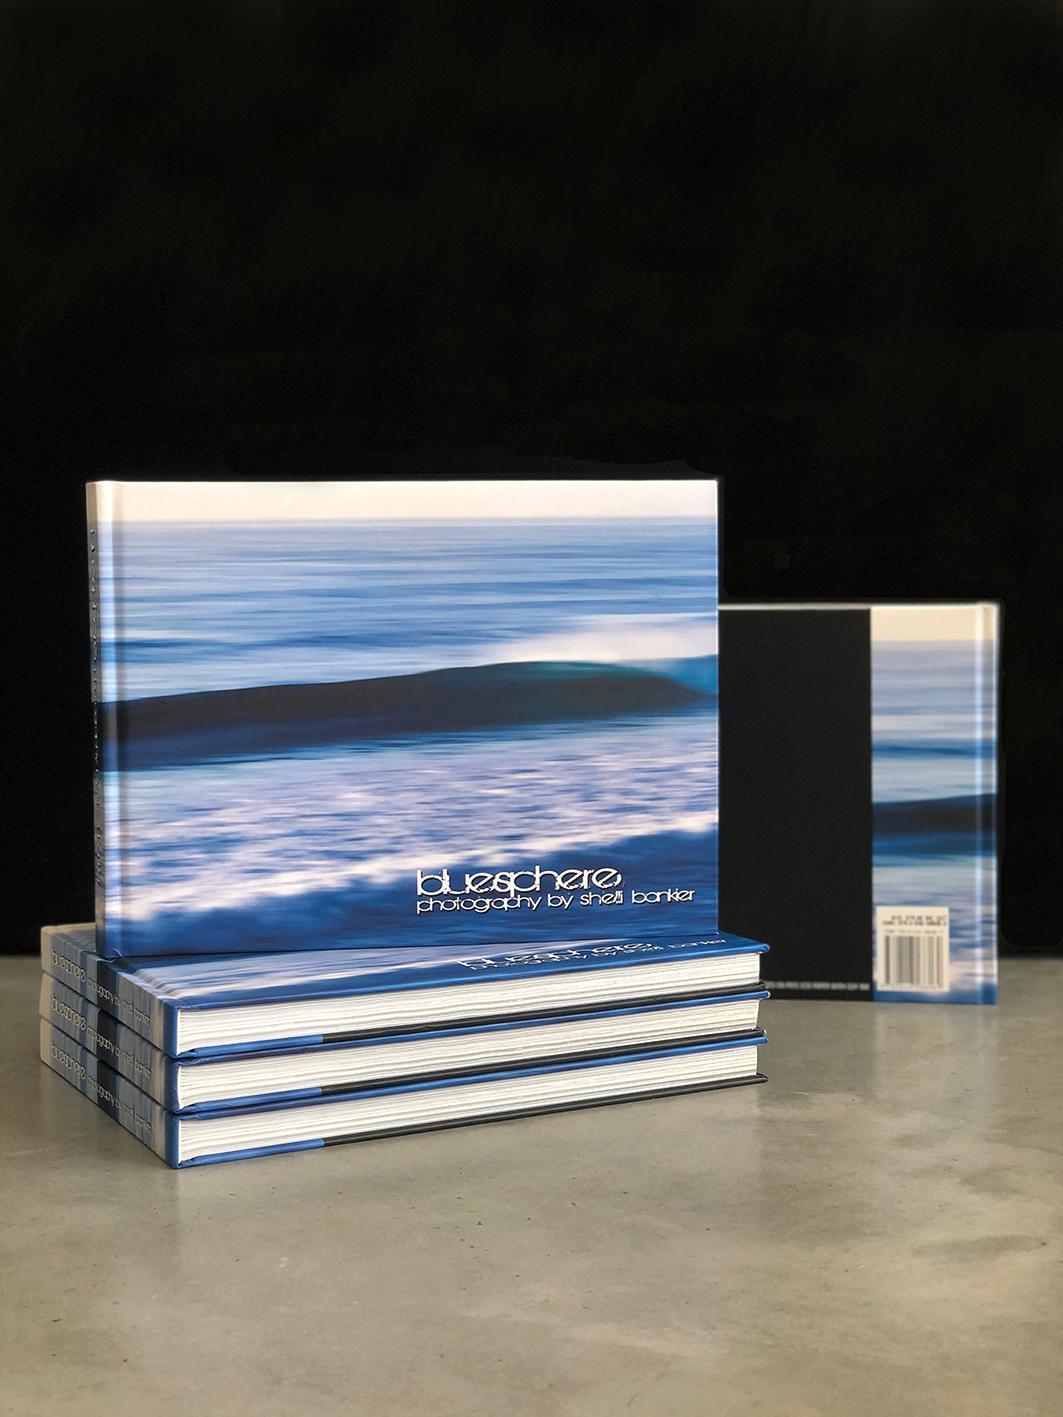 Bluesphere Book (c) Shell Bankier Bluesphere.photography